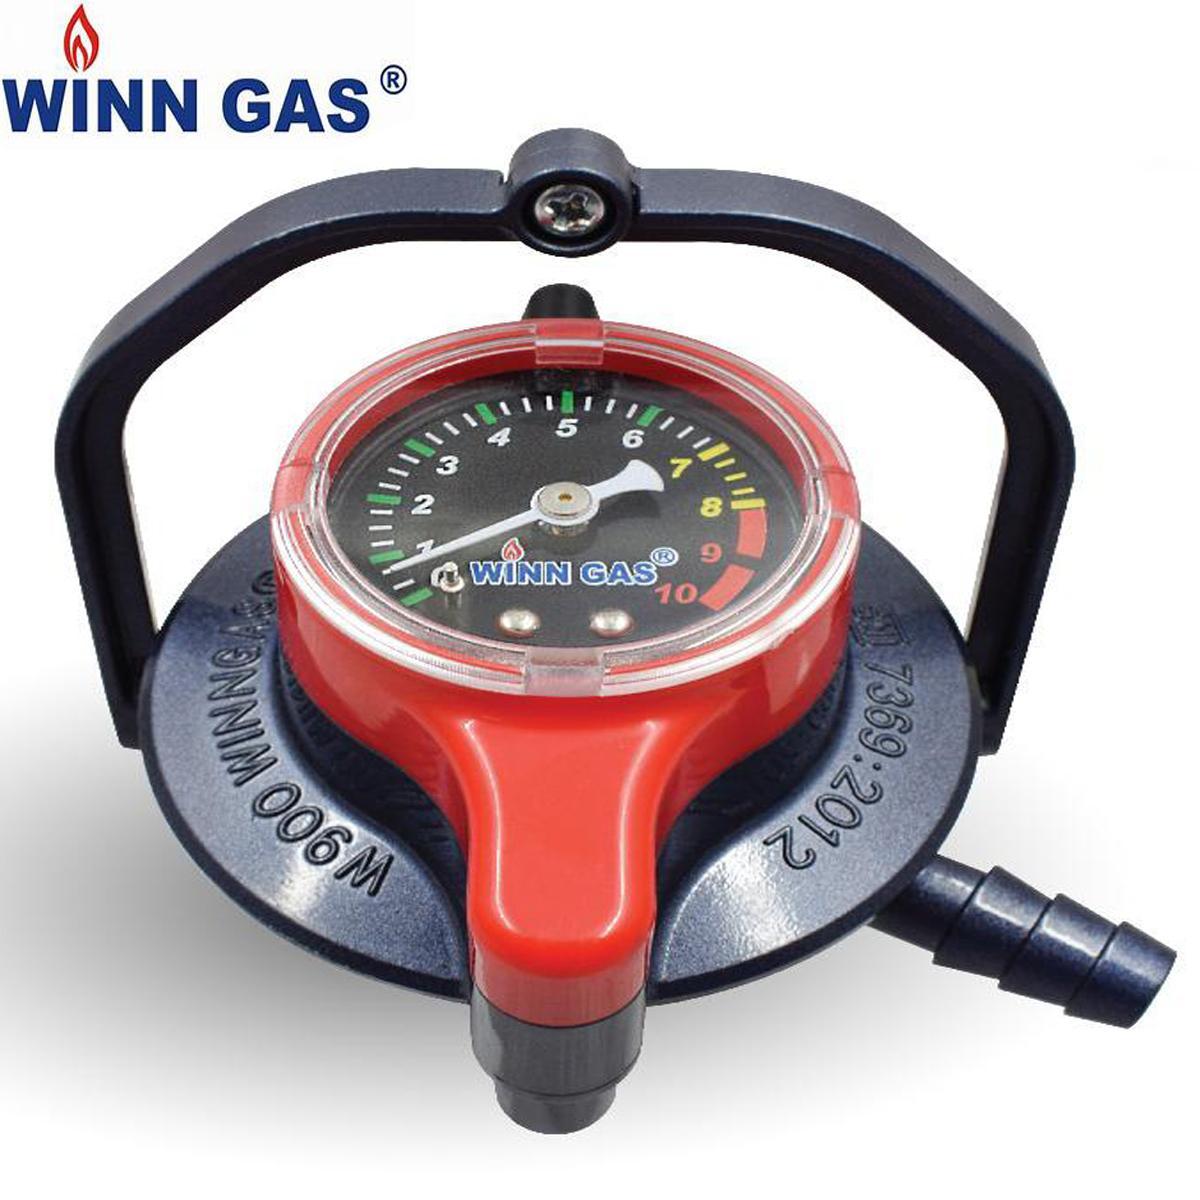 Winn Gas W900-M Regulator LPG